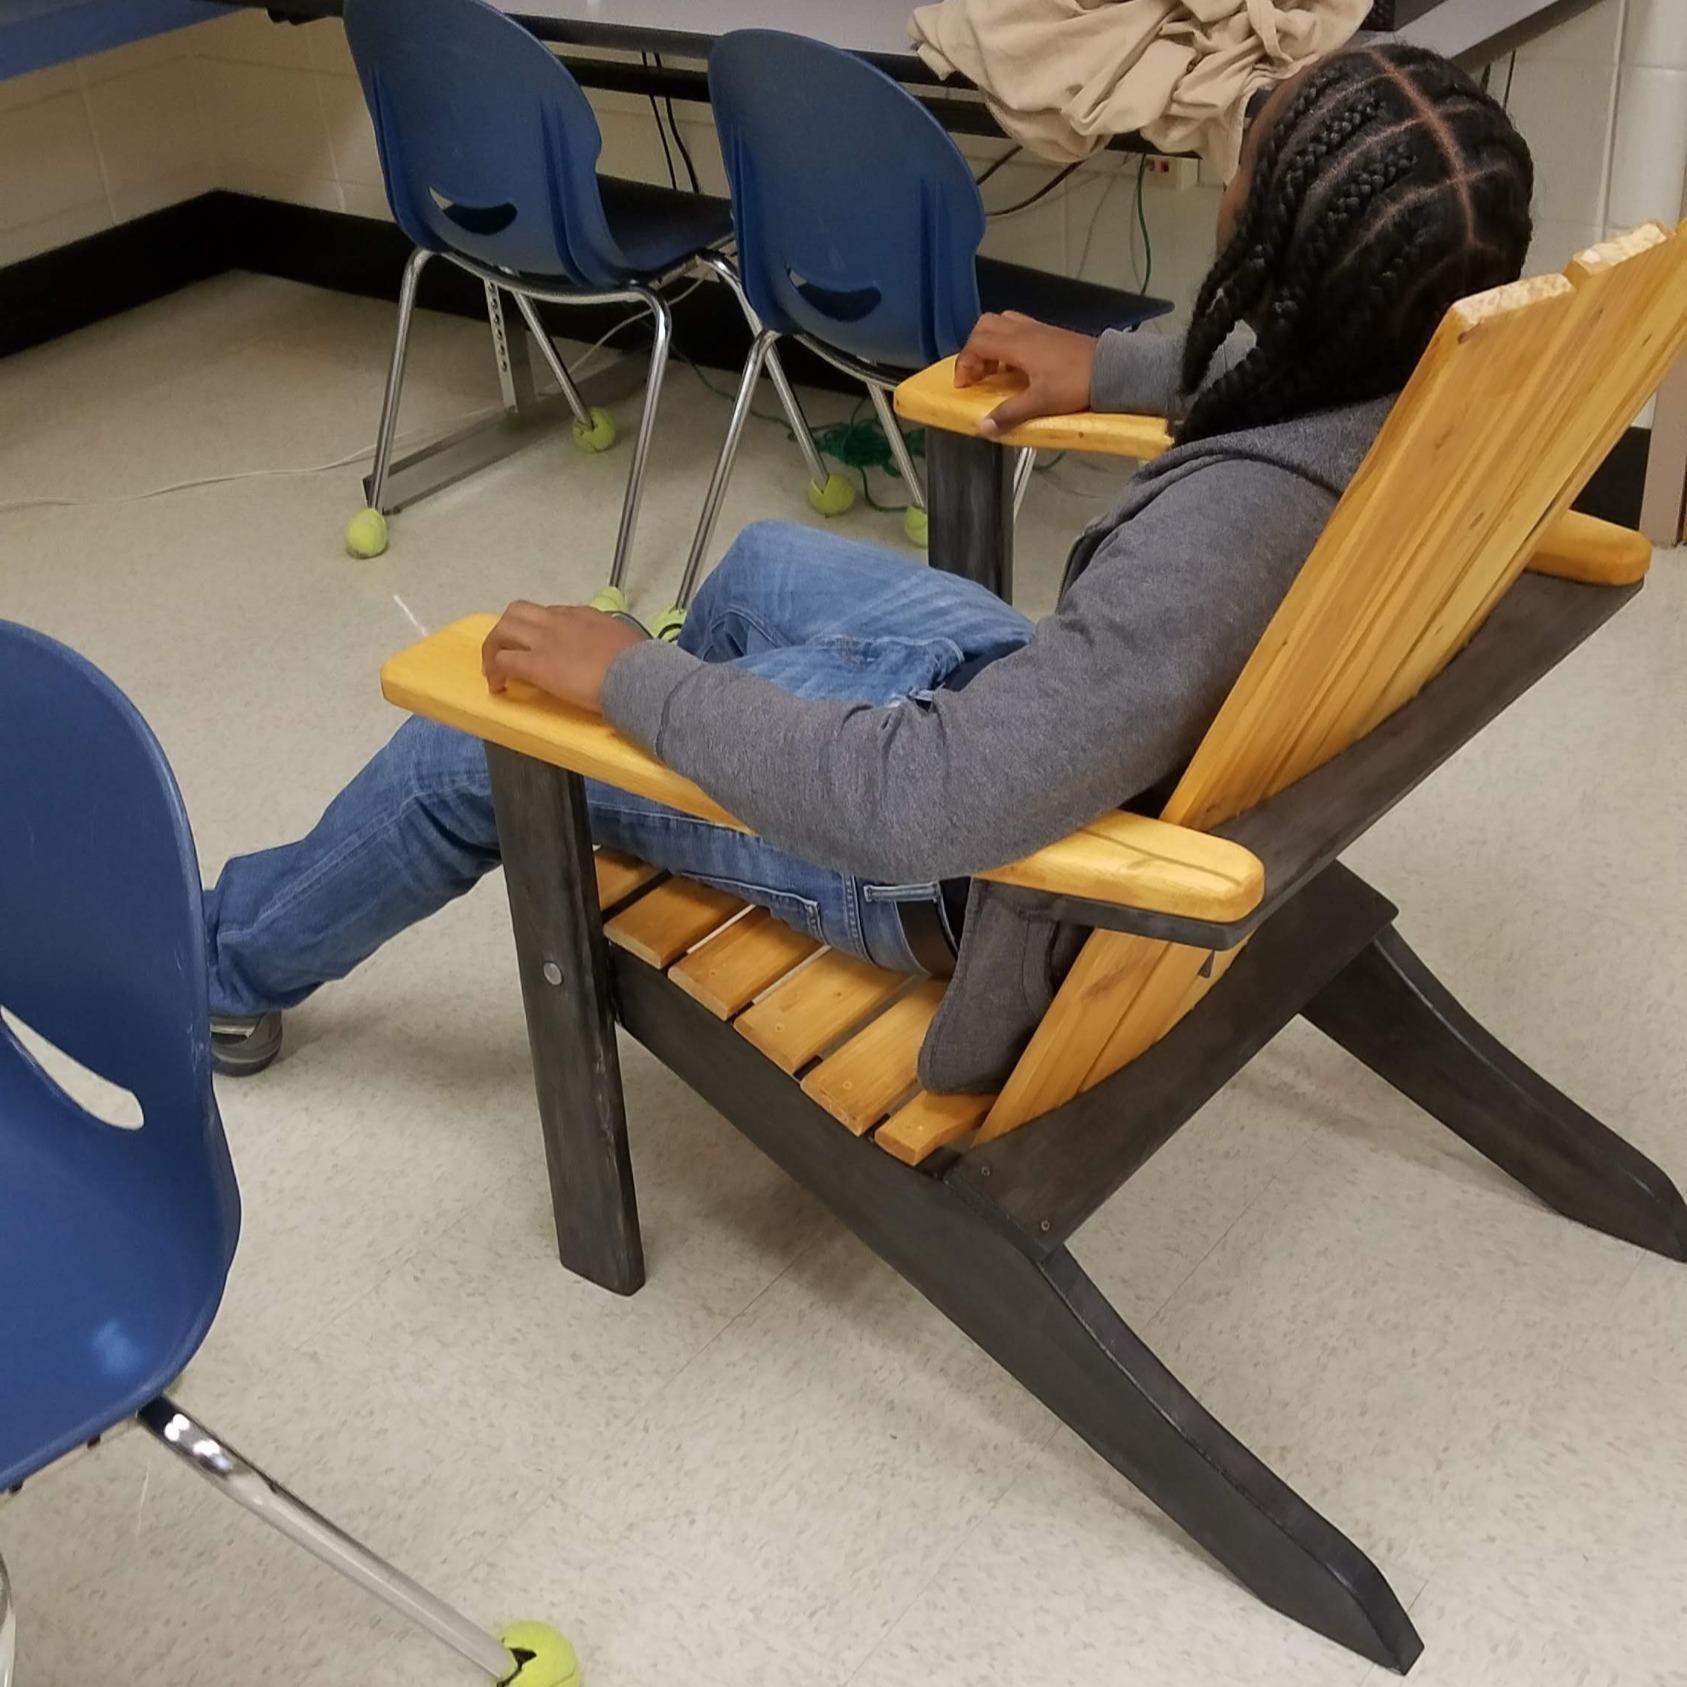 comfort, wooden chair, relax, braids, black boy joy